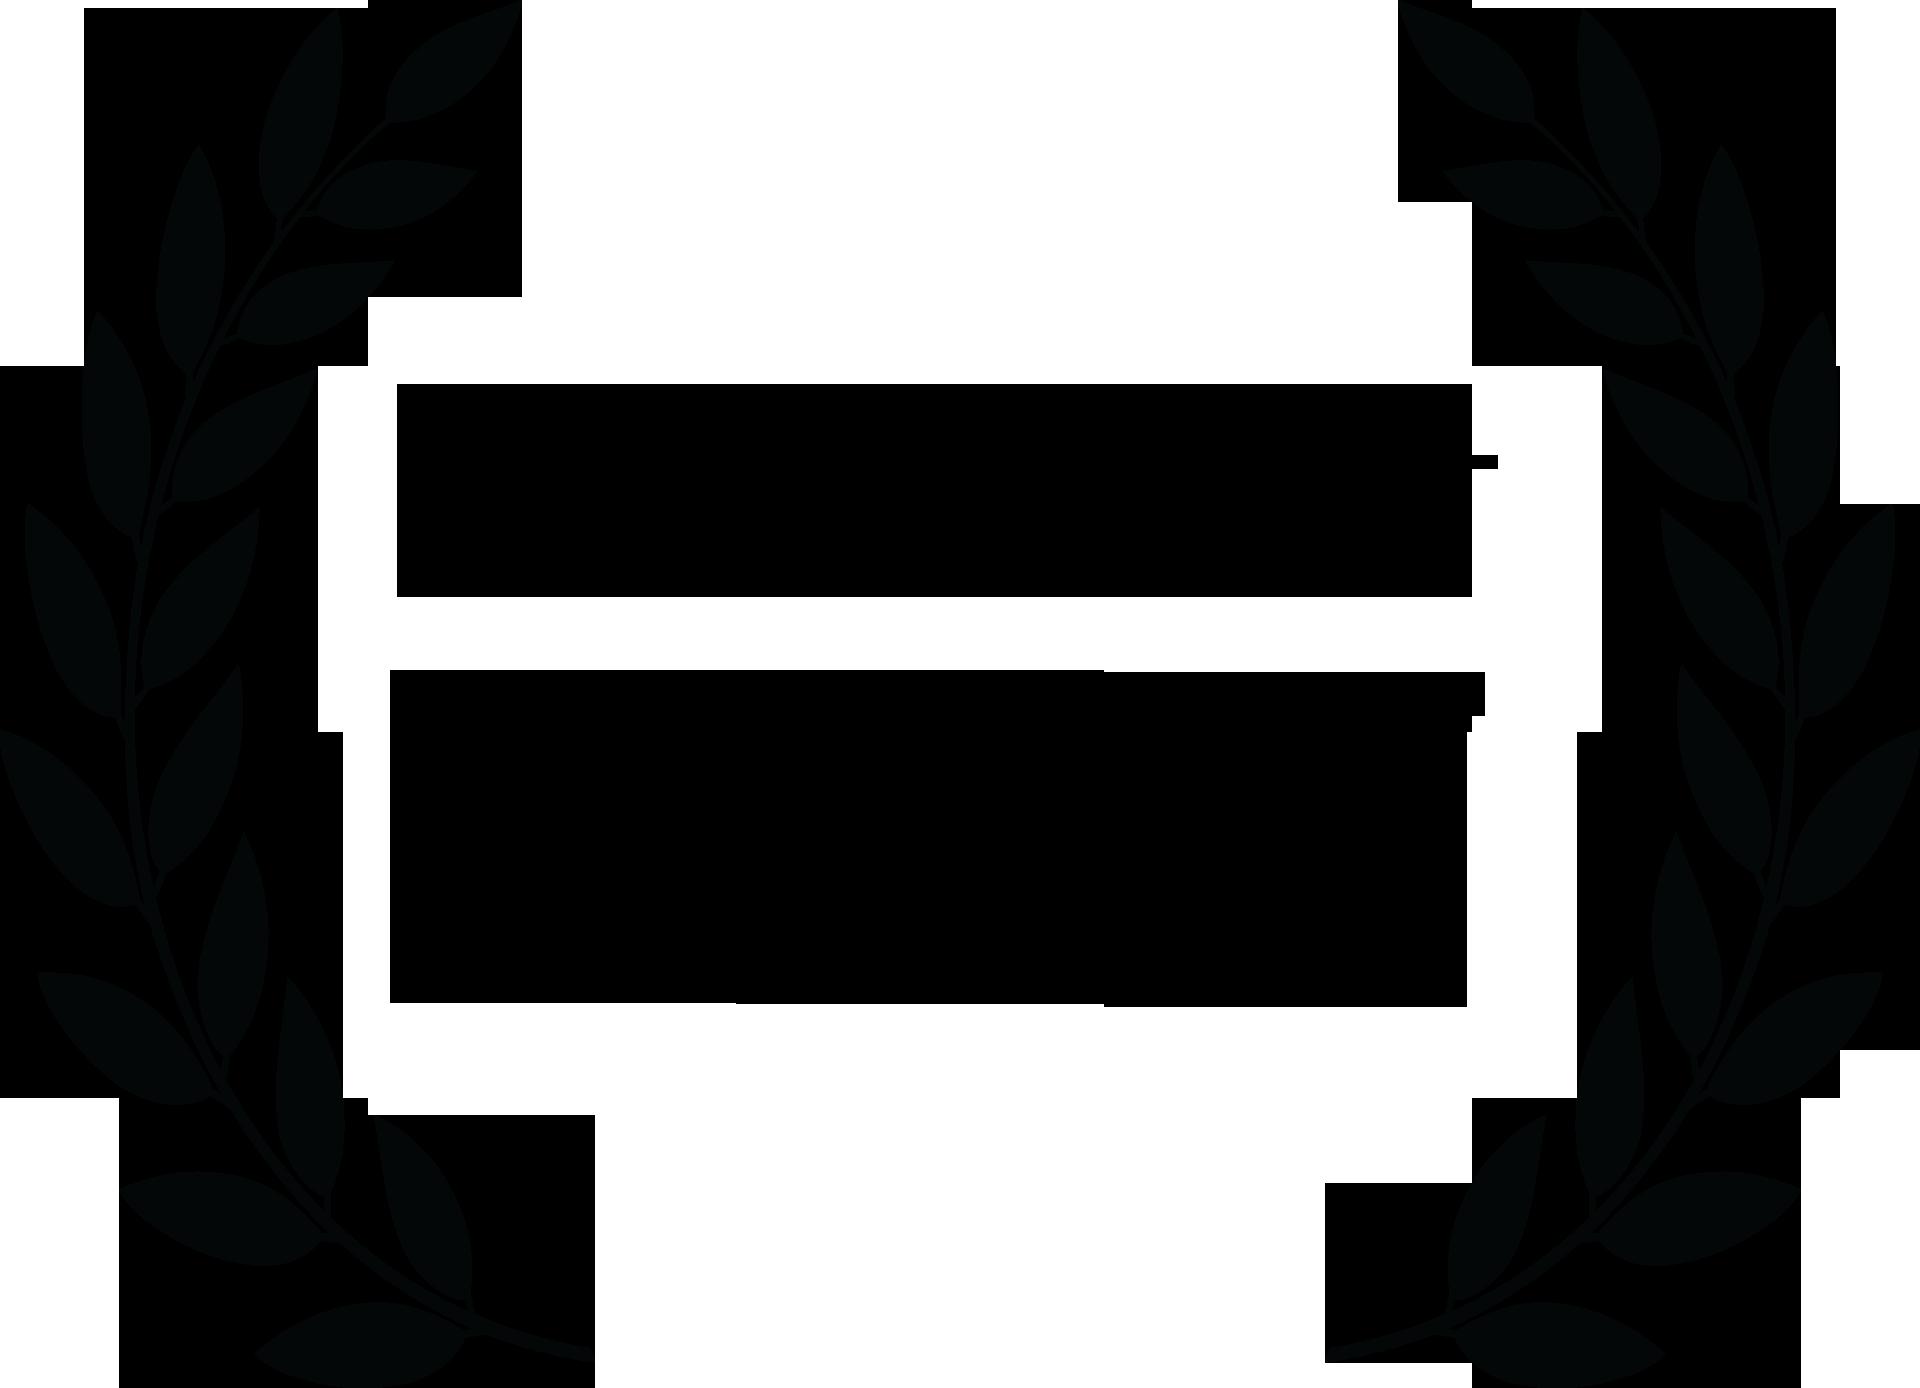 Movie clipart film festival. Audre lorde the berlin